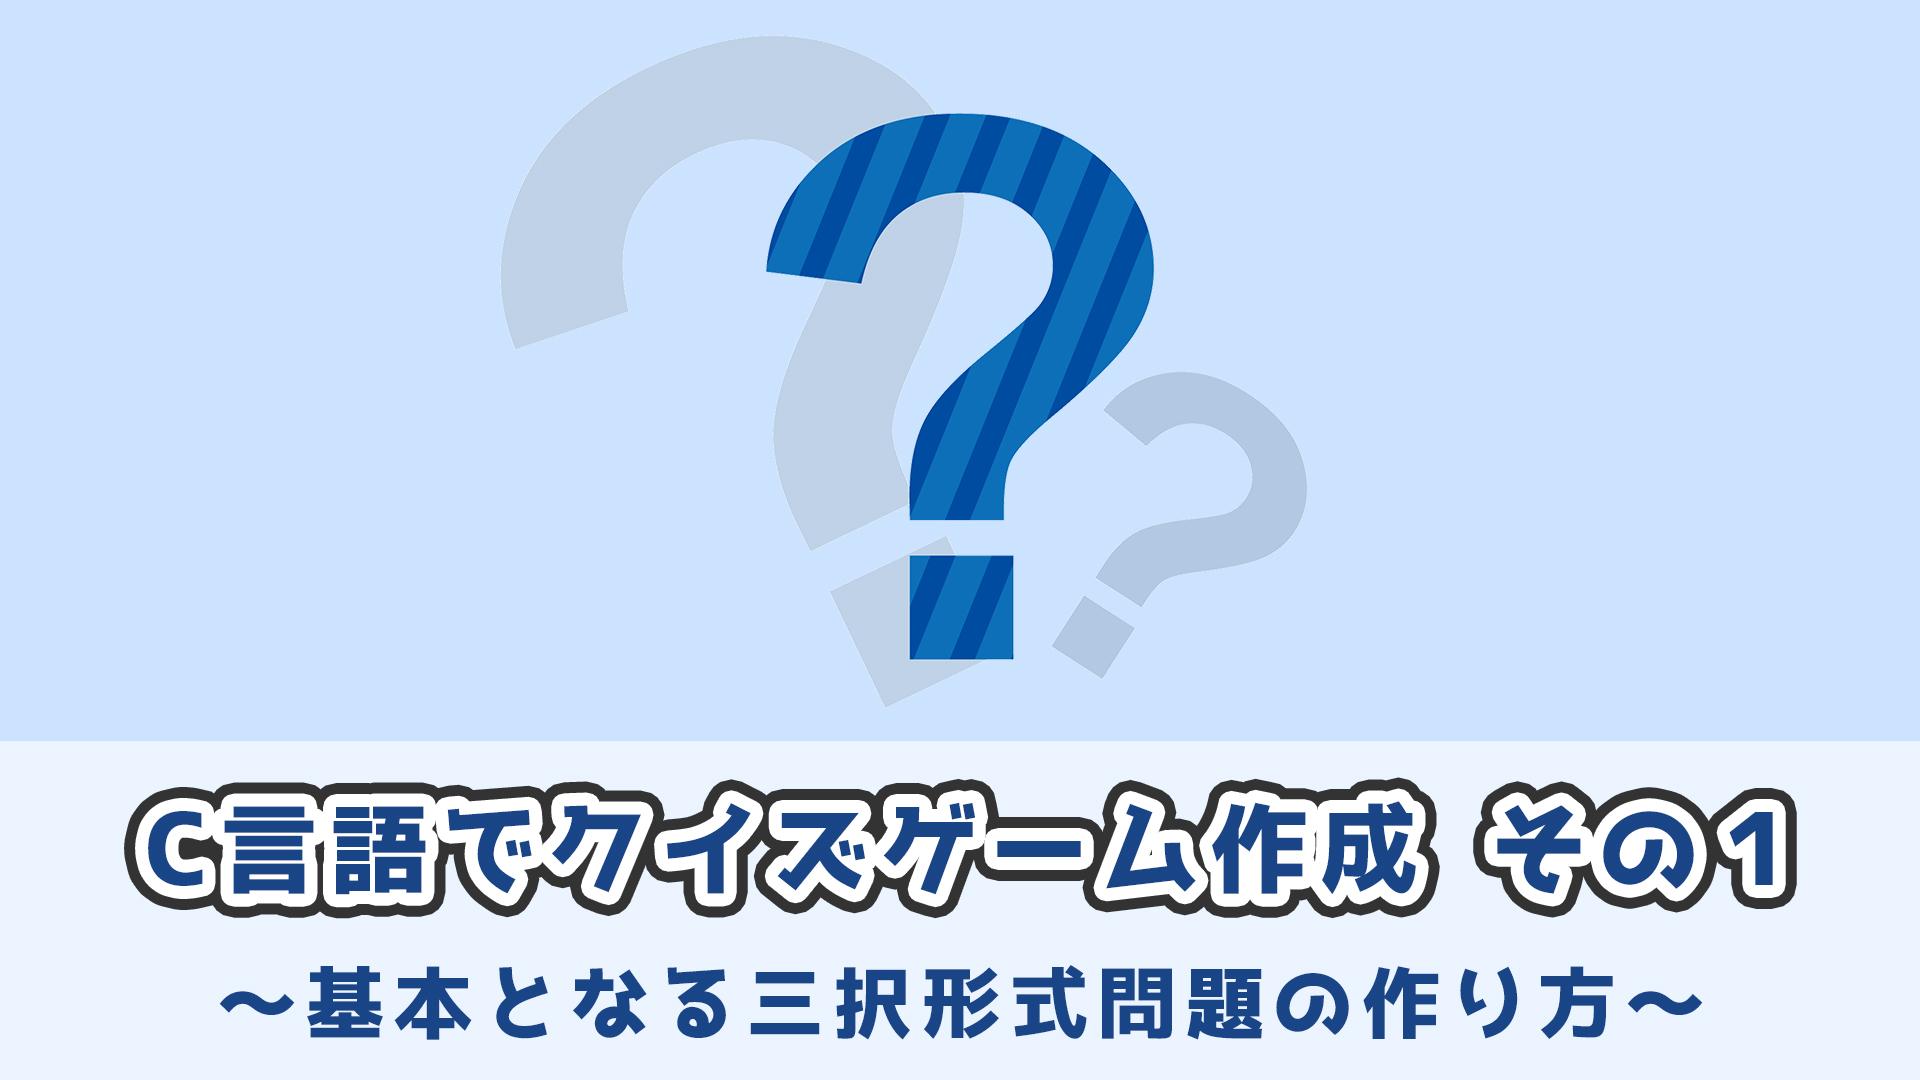 【C言語】クイズゲーム作成(1)簡単な三択形式の問題_サムネ3